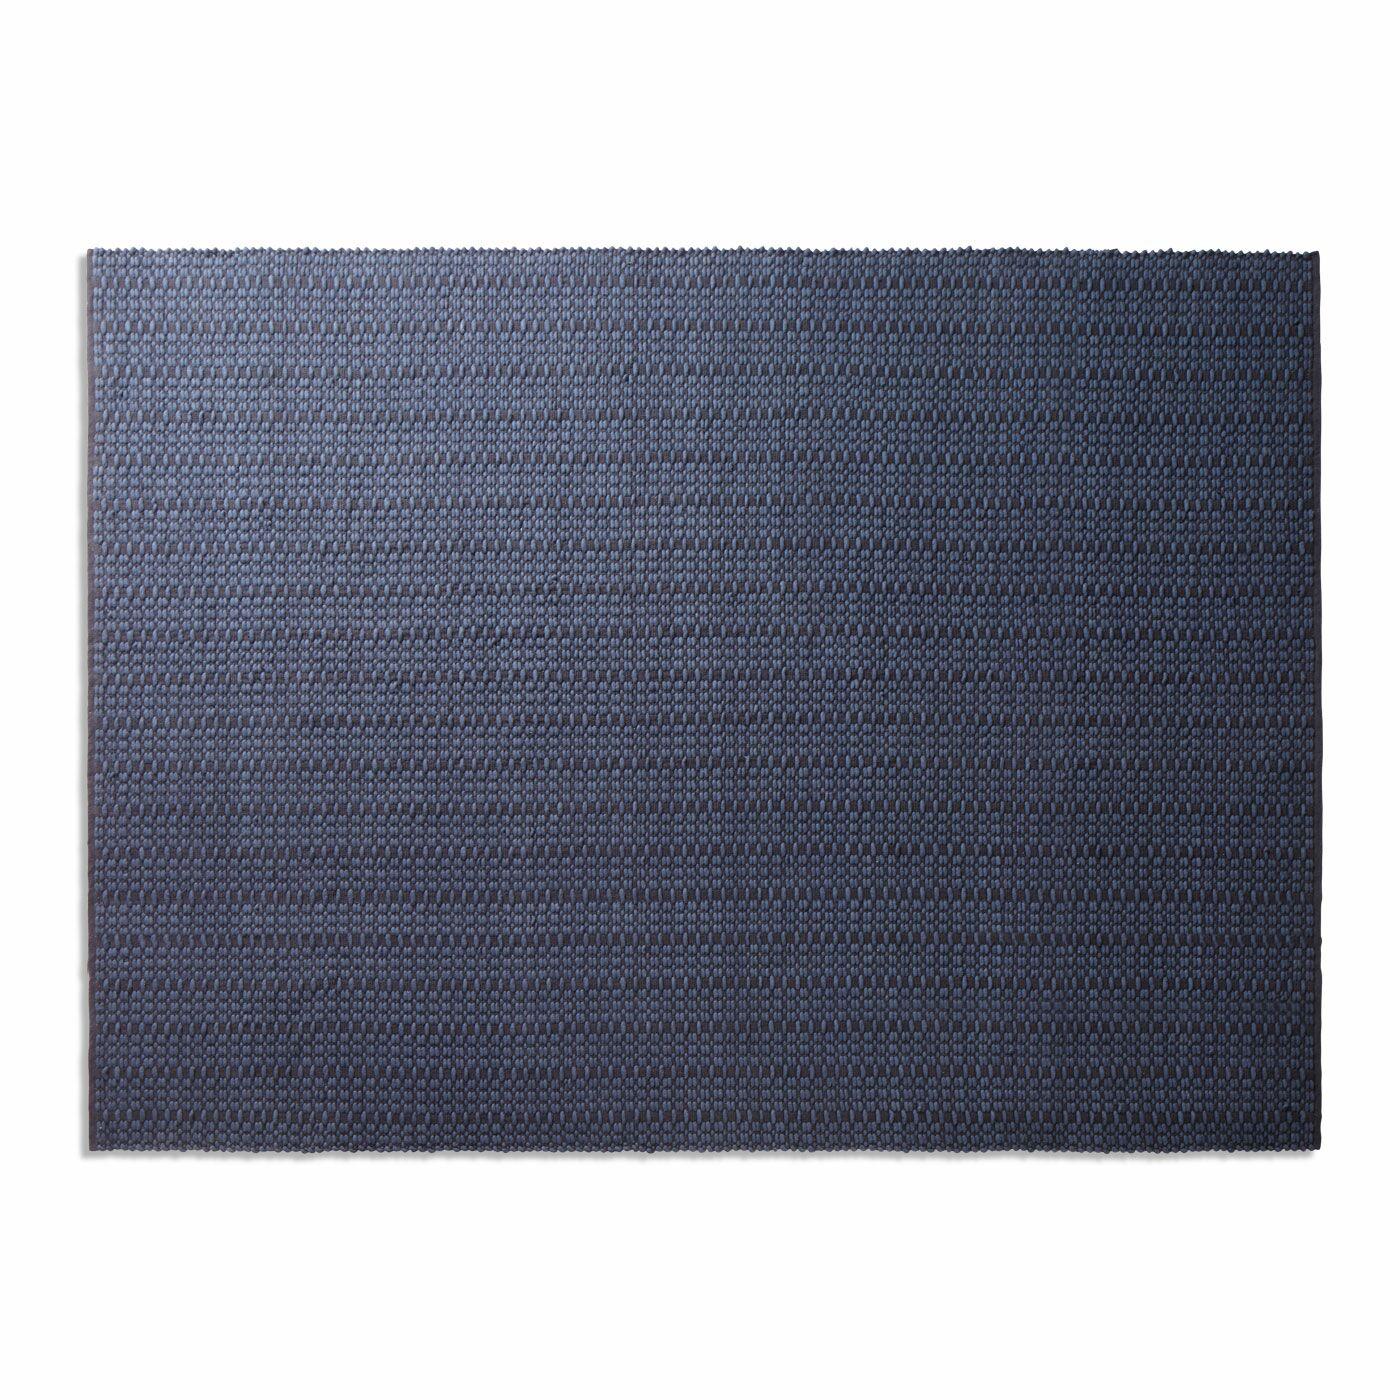 Weft Dark Blue Area Rug Rug Size: 9' x 12'